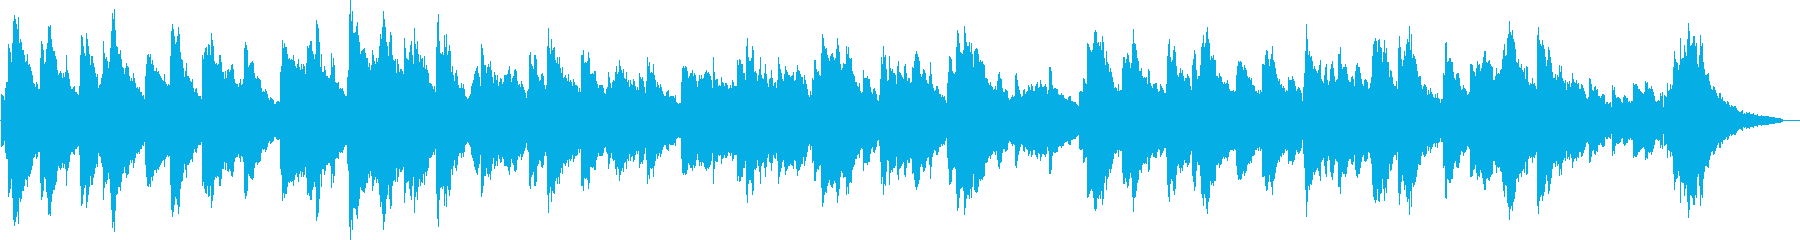 Sleepy Rhose 1の再生済みの波形